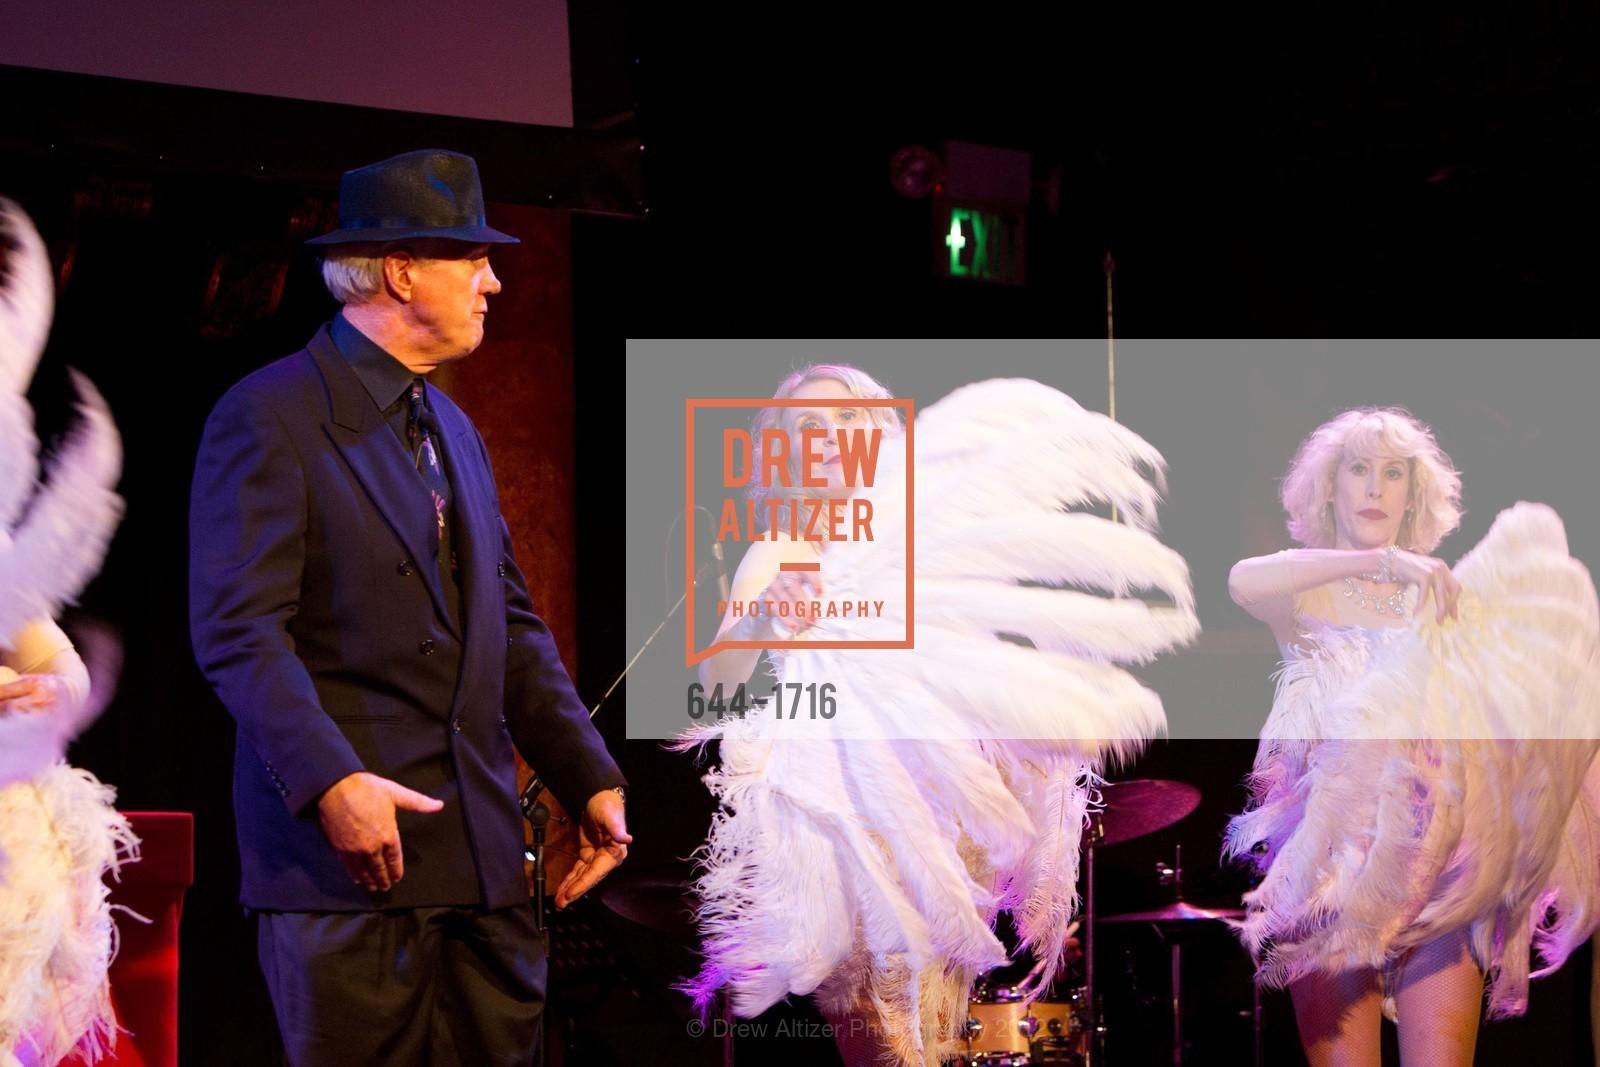 Performance, Photo #644-1716